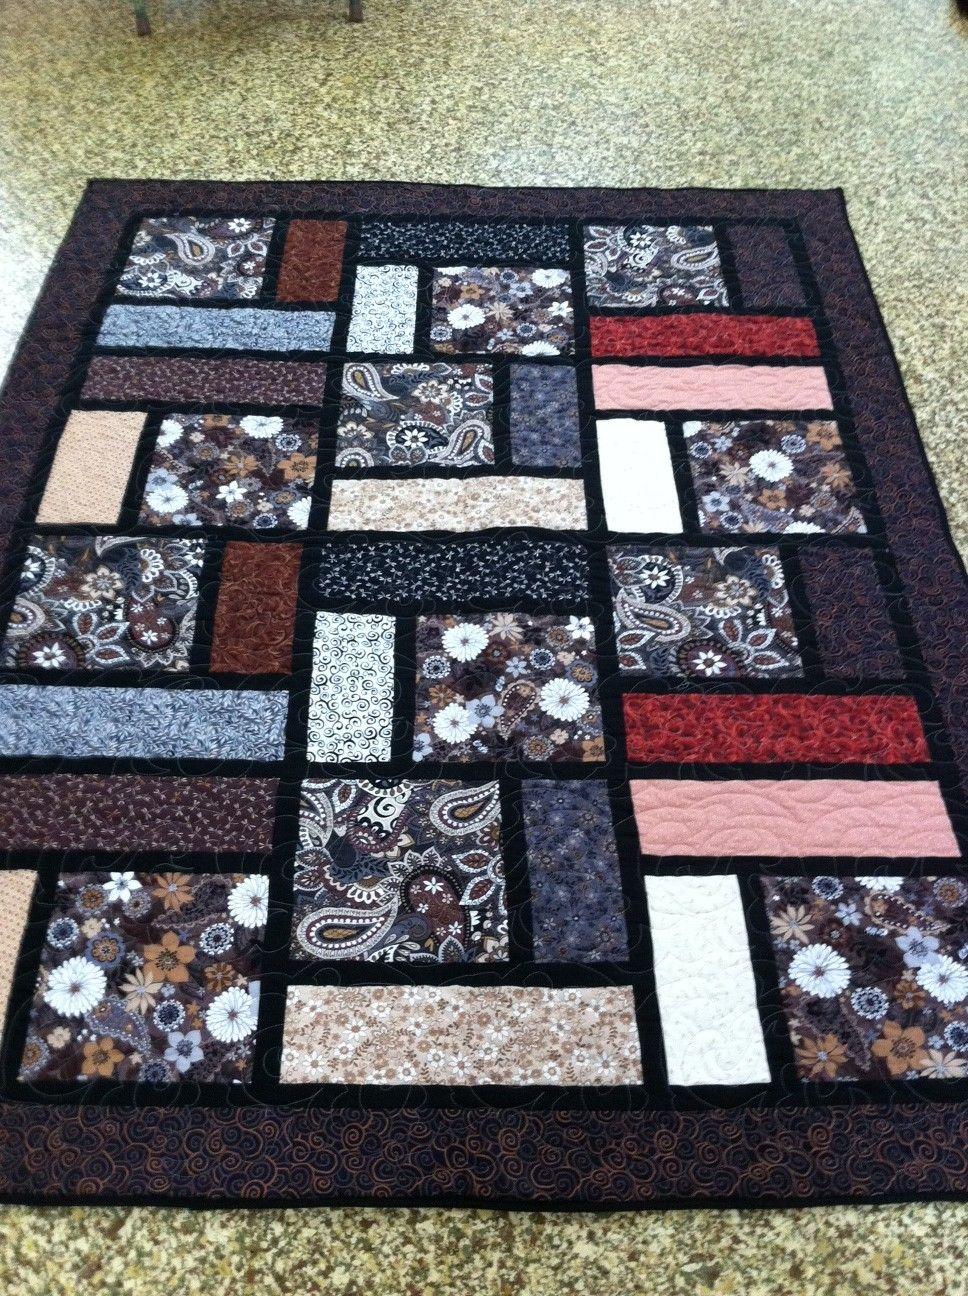 ://s-media-cache-ak0.pinimg.com/originals/7a/... : large block quilt patterns - Adamdwight.com